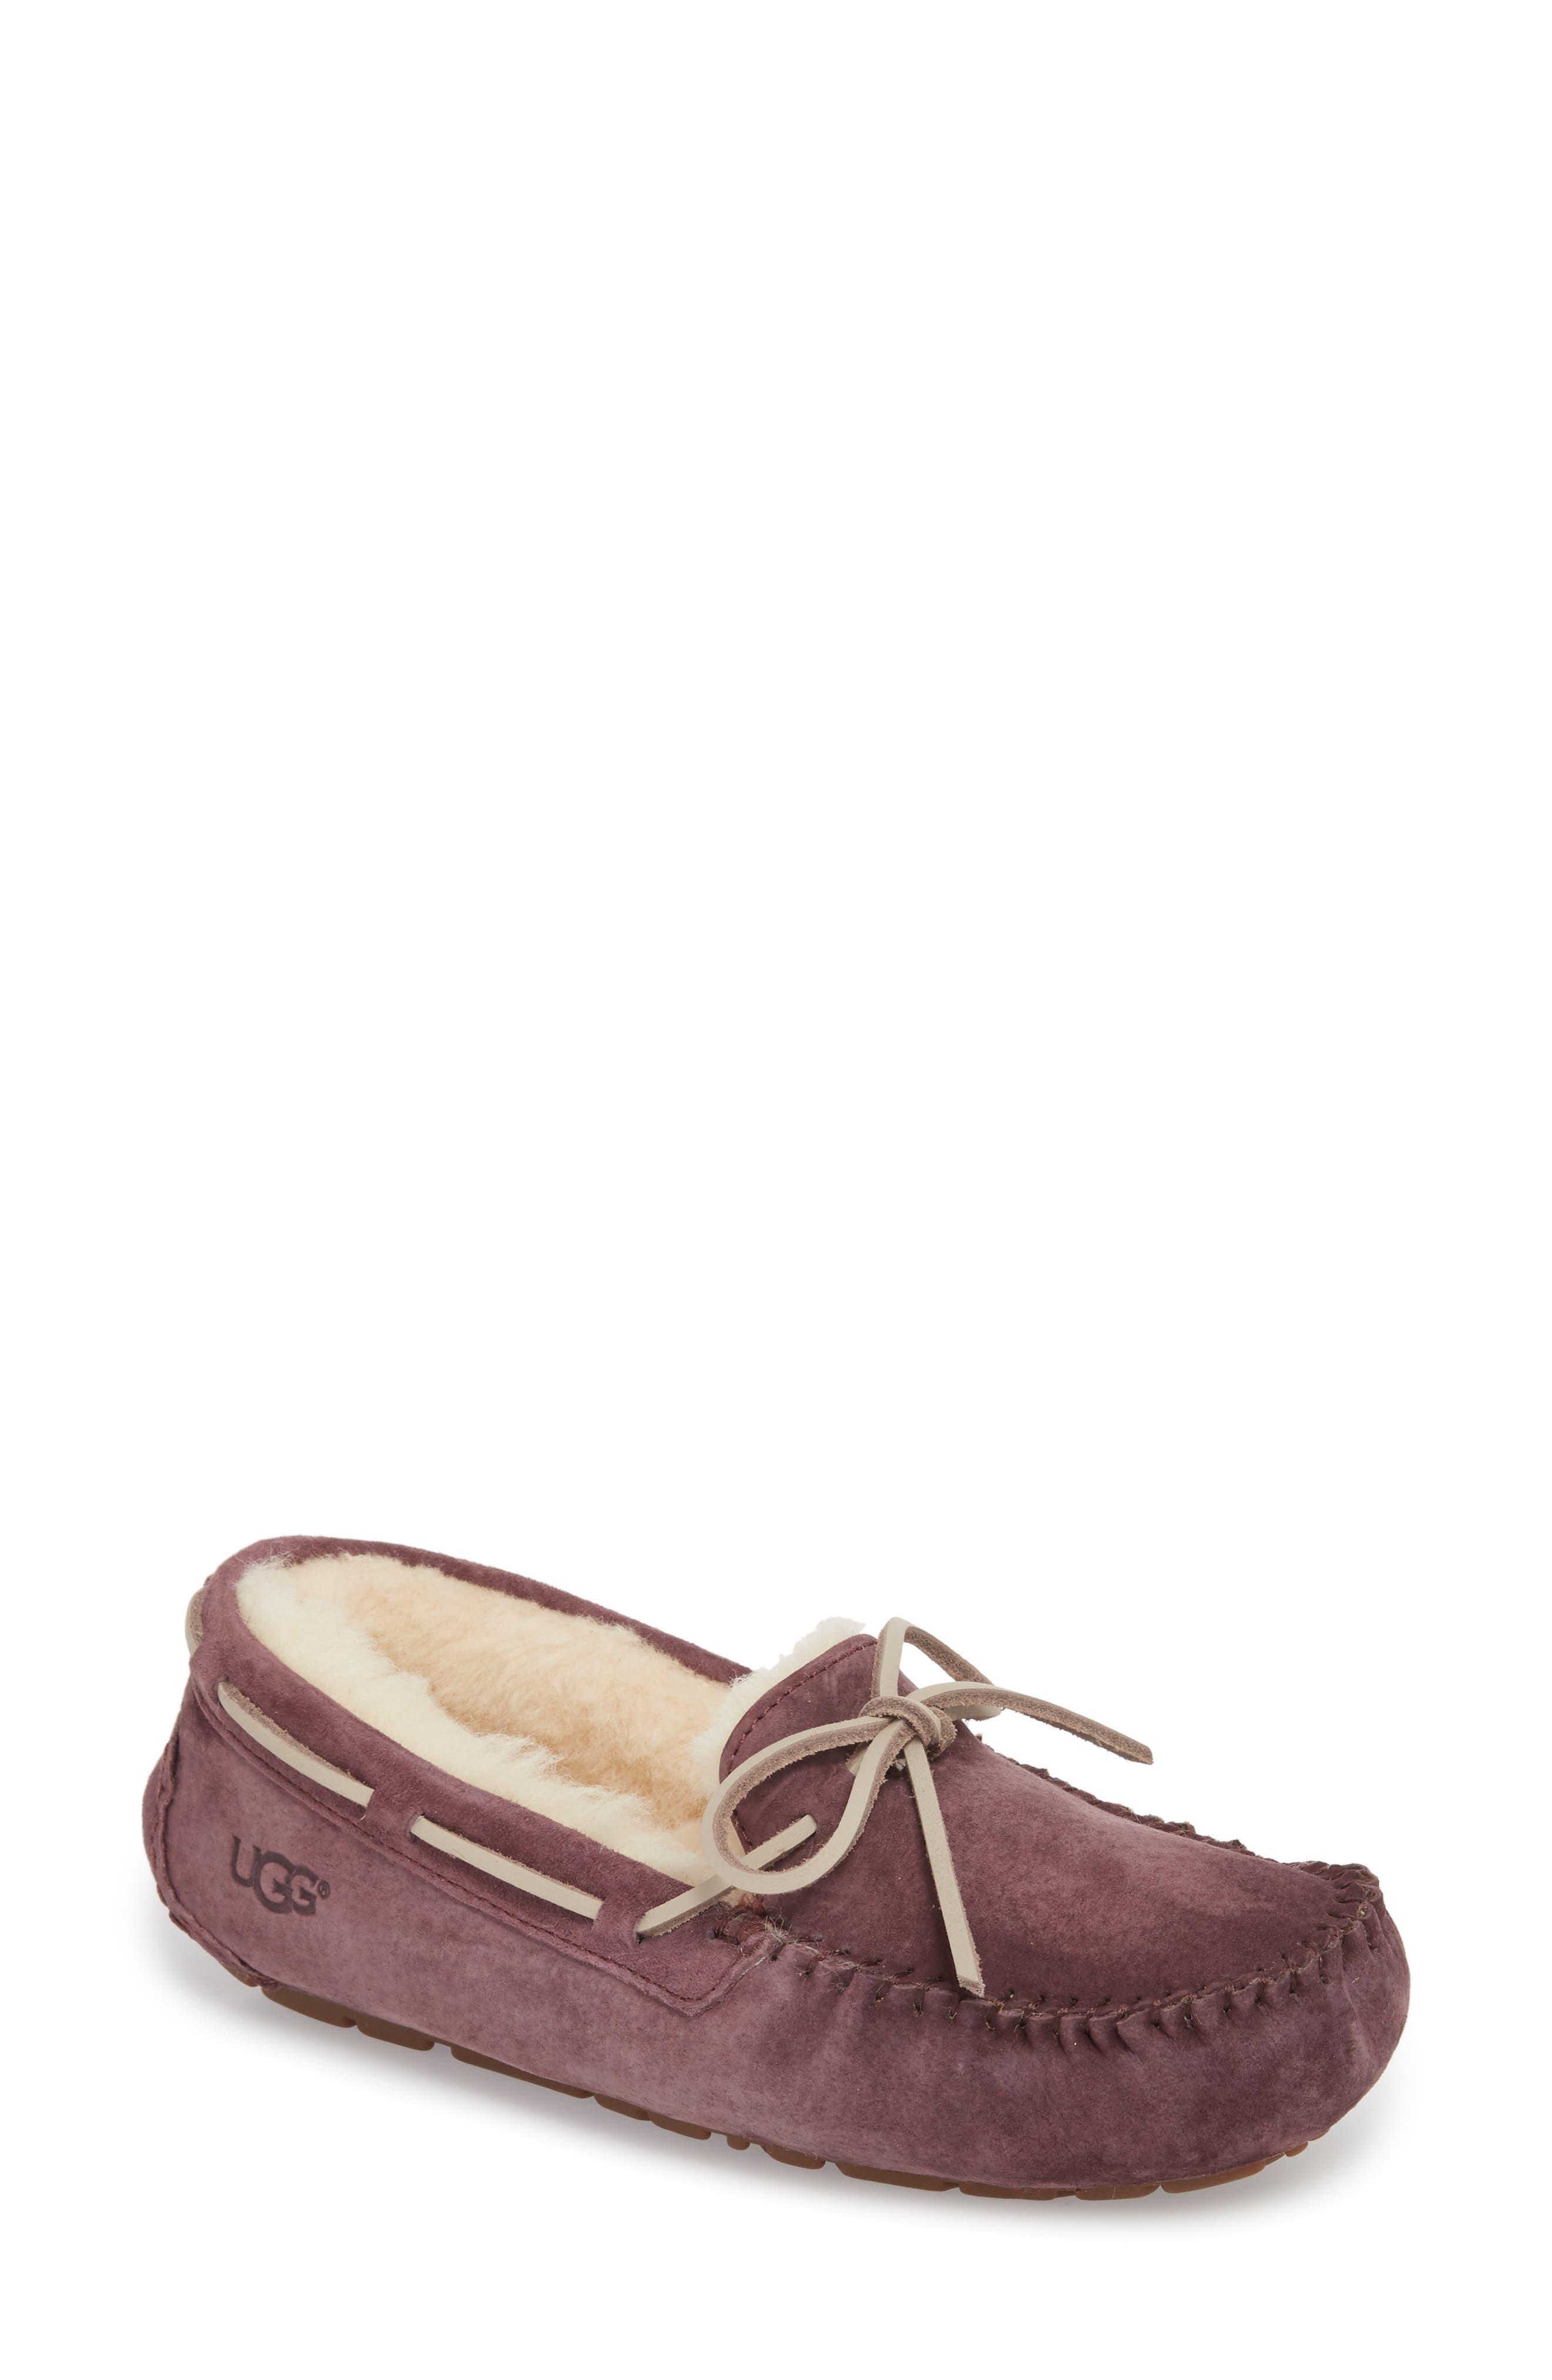 Dakota Slipper,                         Main,                         color, Port